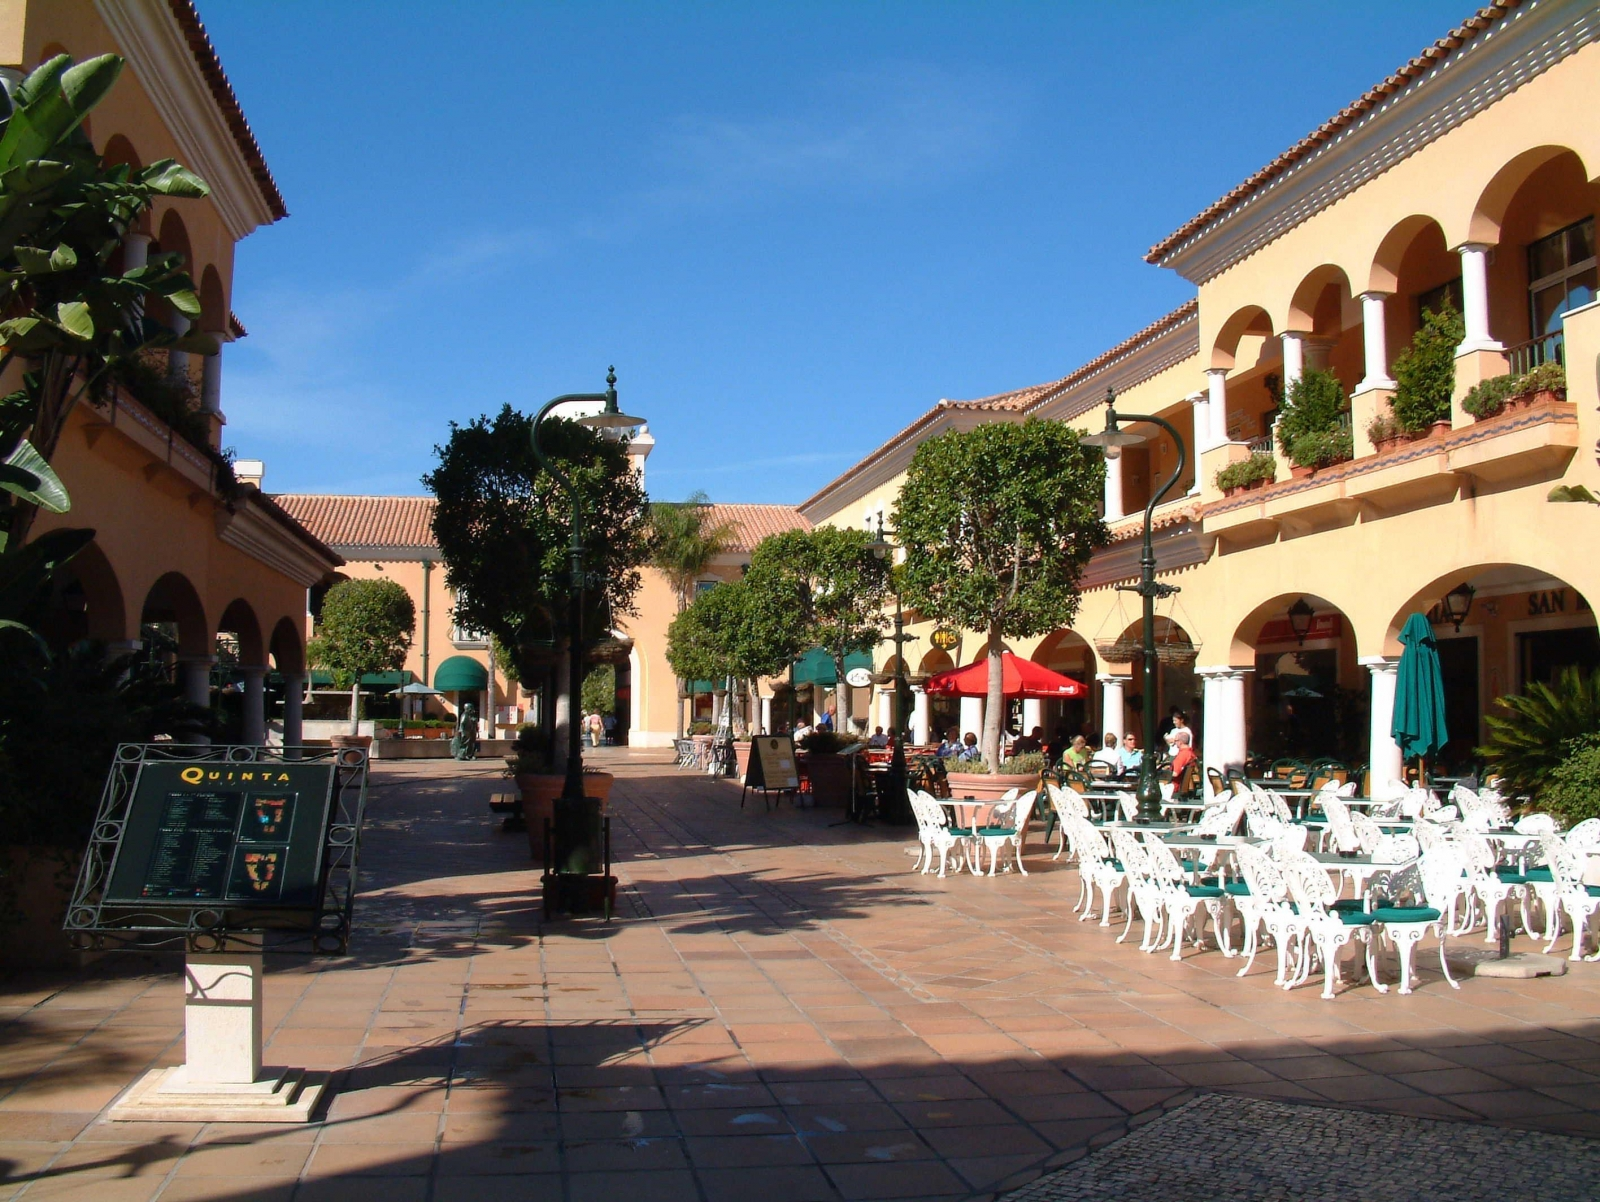 Melting Pot Algarve Portal